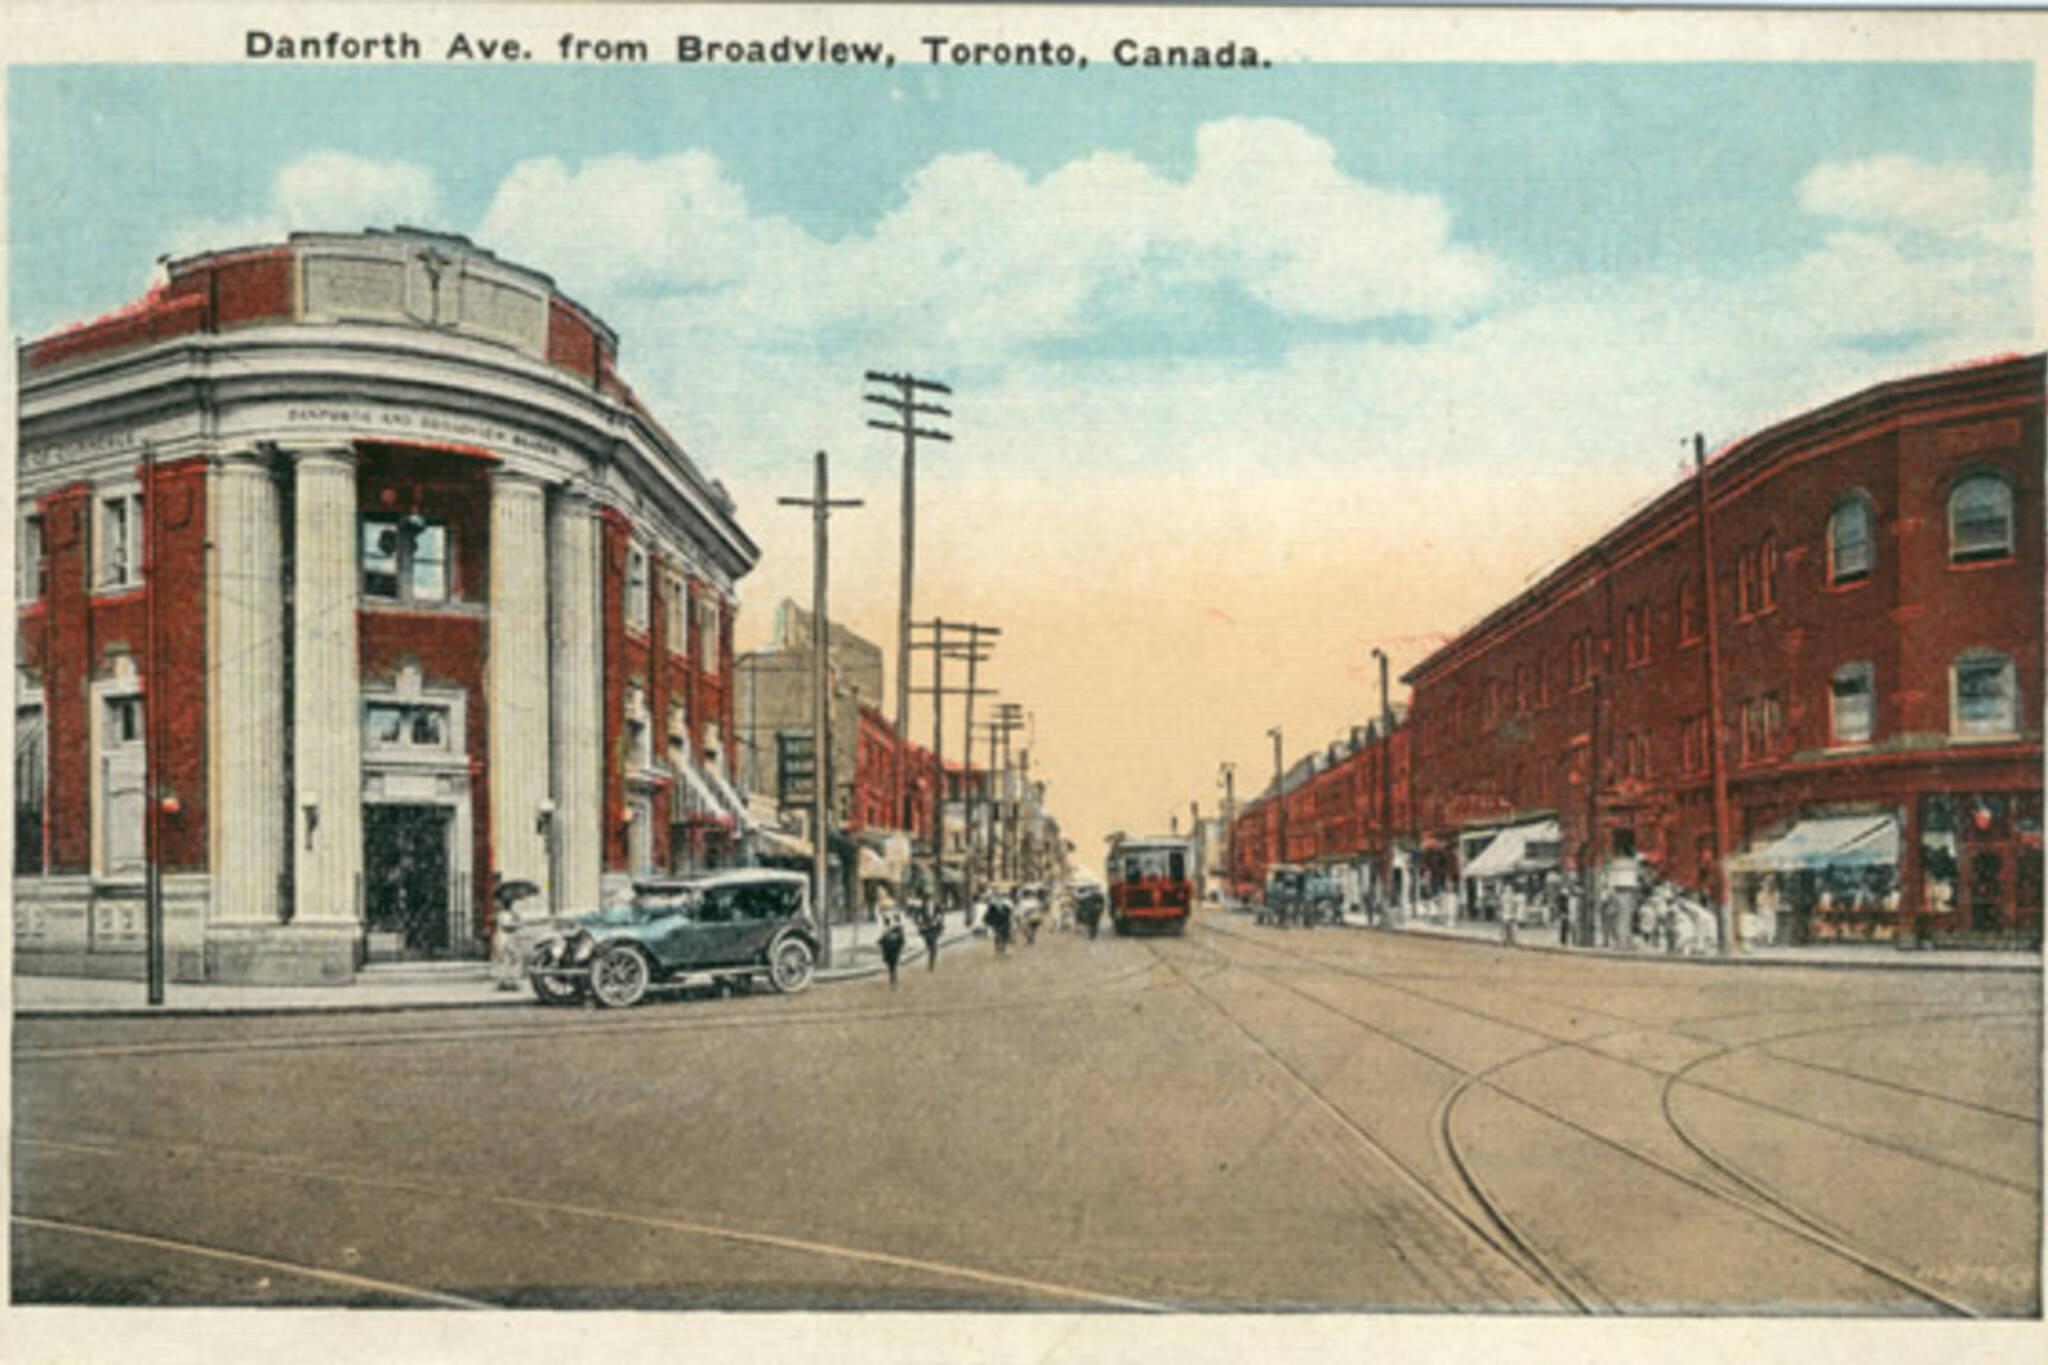 Danforth Toronto history